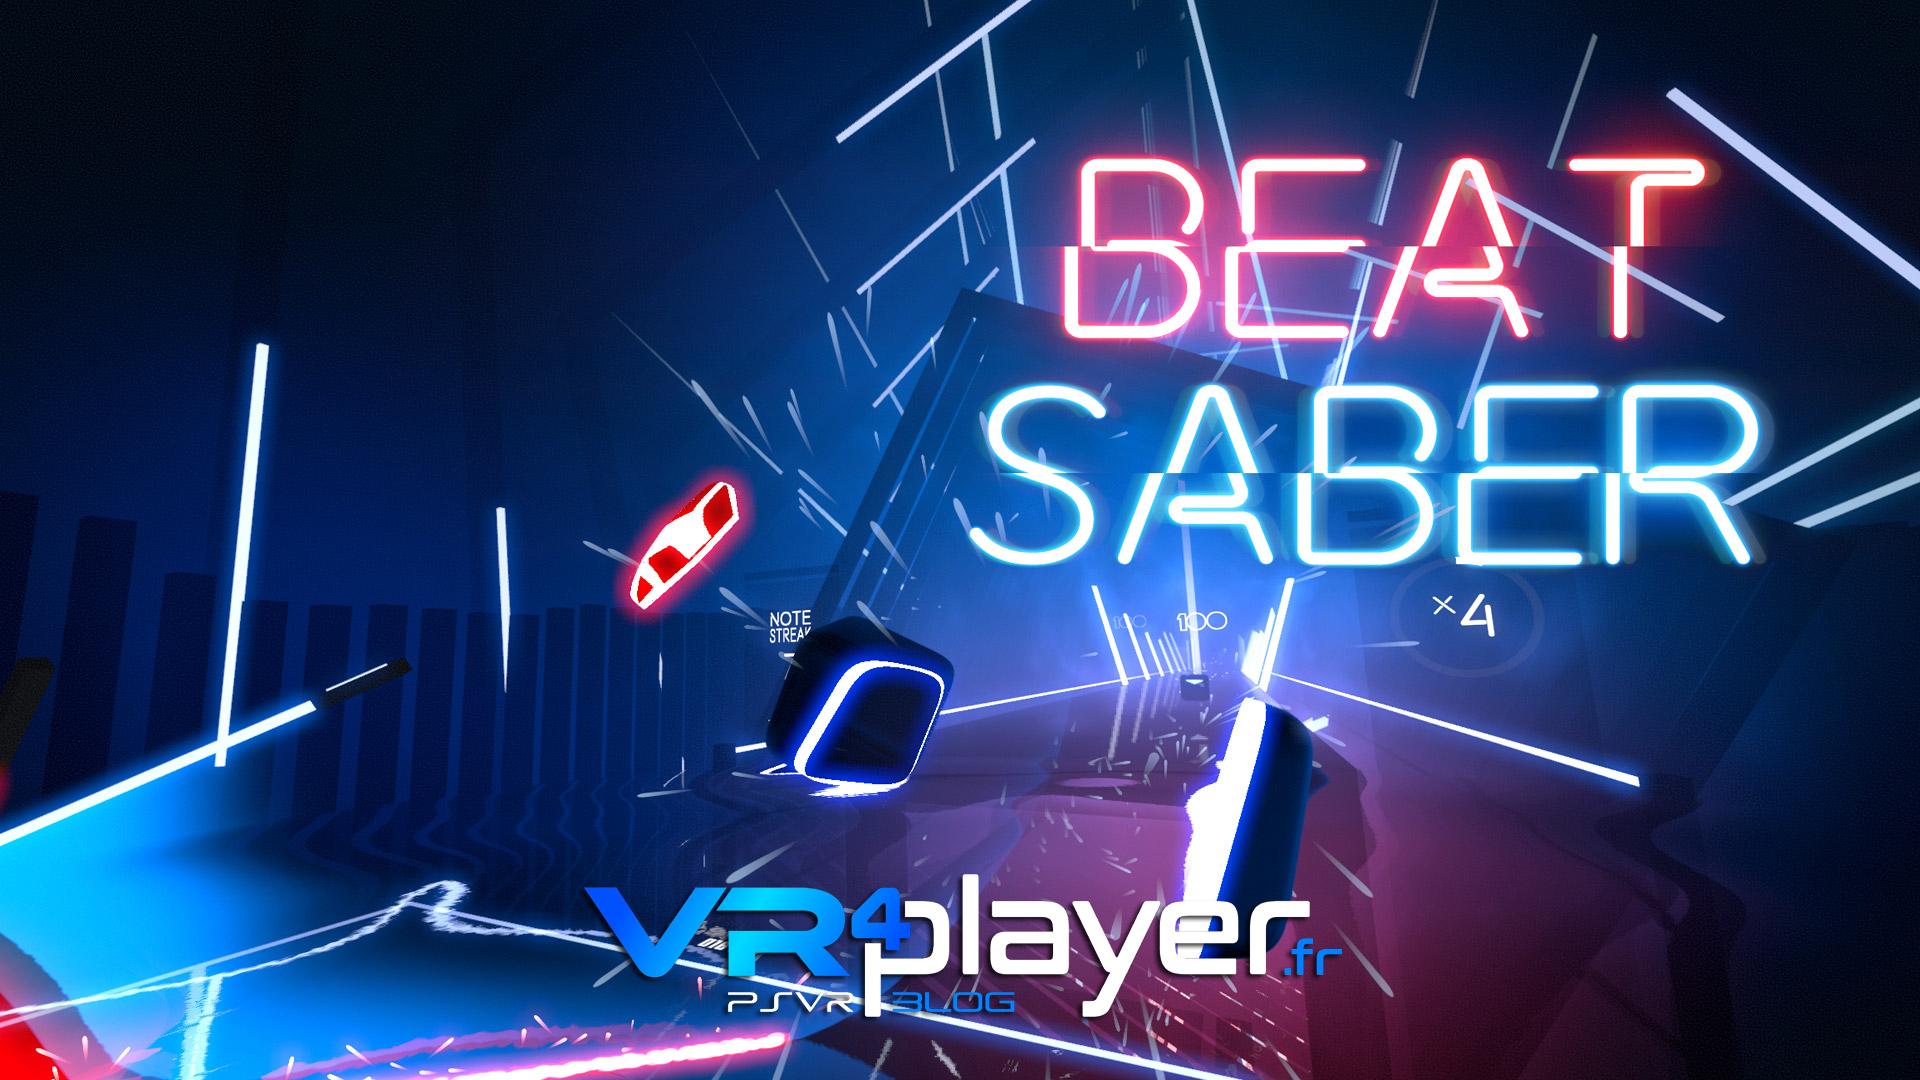 BEAT SABER est le jeu PSVR tant attendu VR4Player.fr